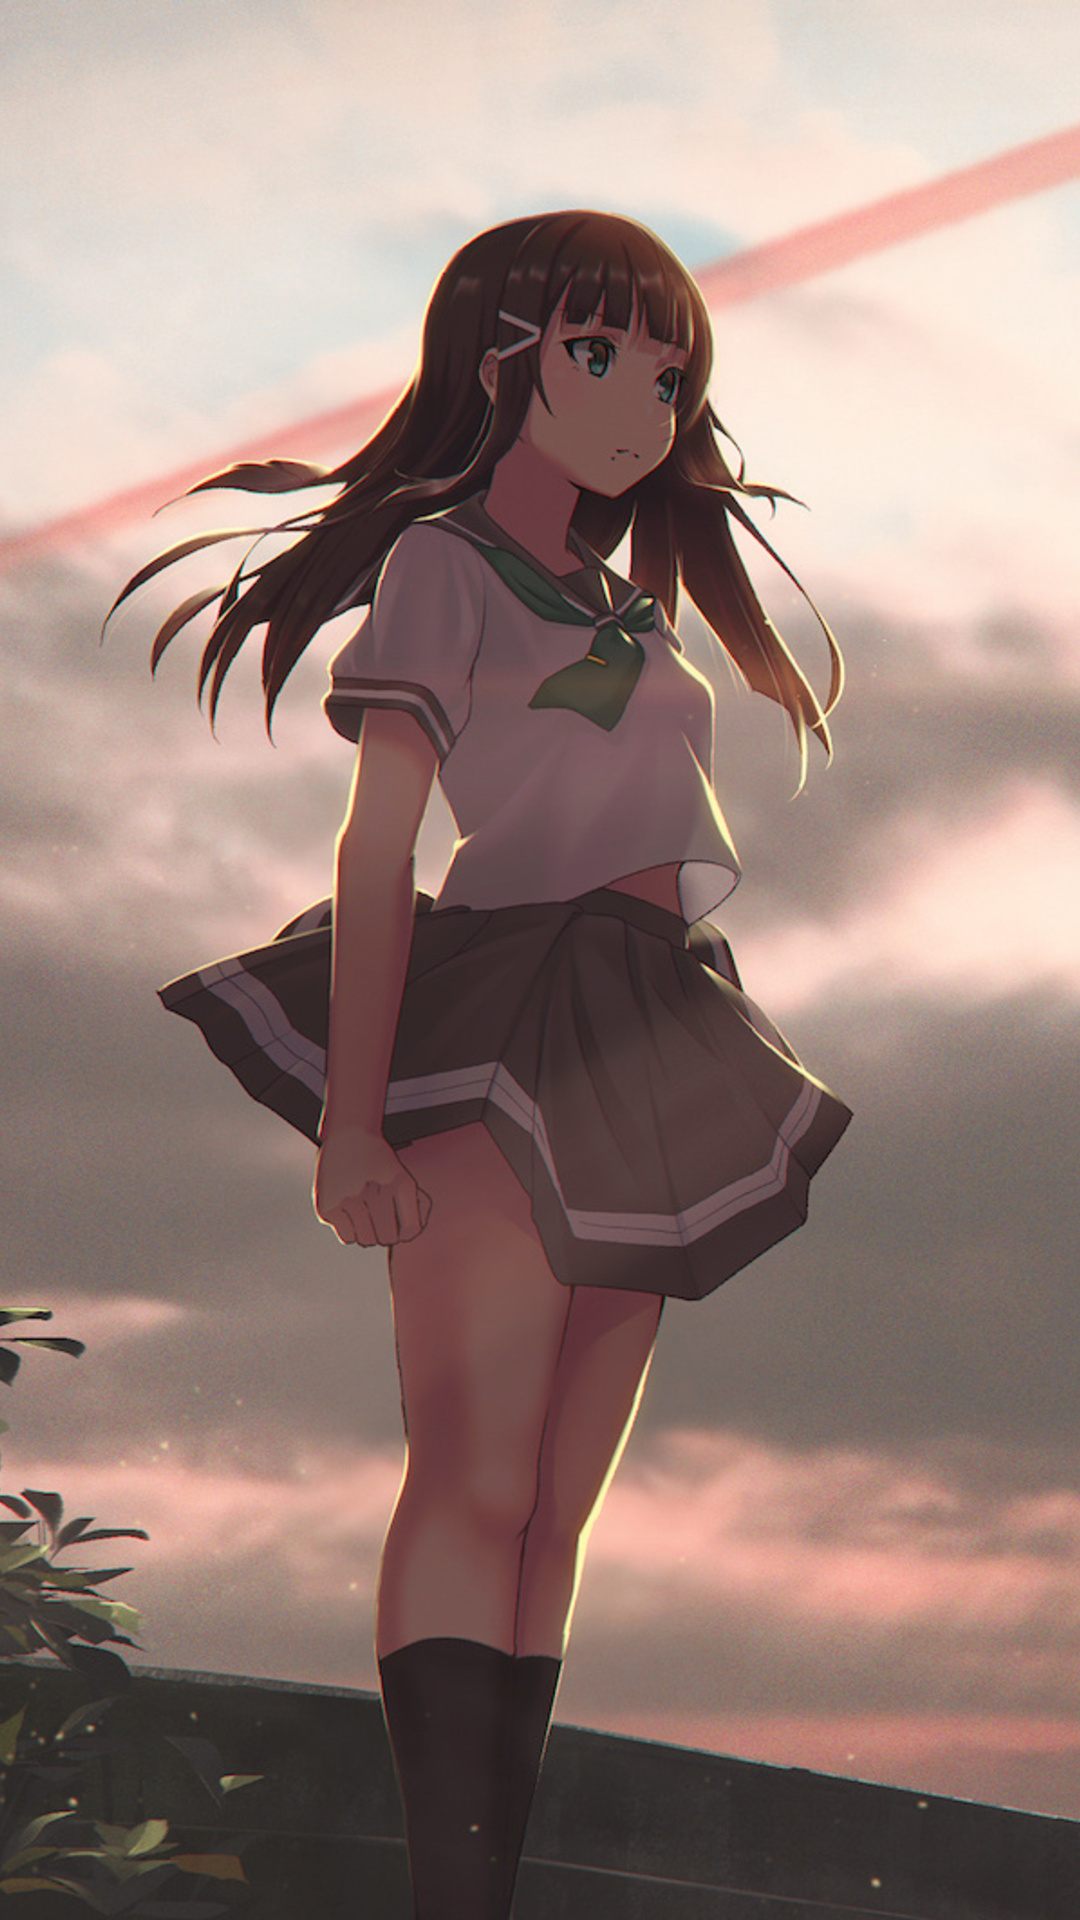 1080x1920 Anime Love Live Sunshine Iphone 7,6s,6 Plus ...